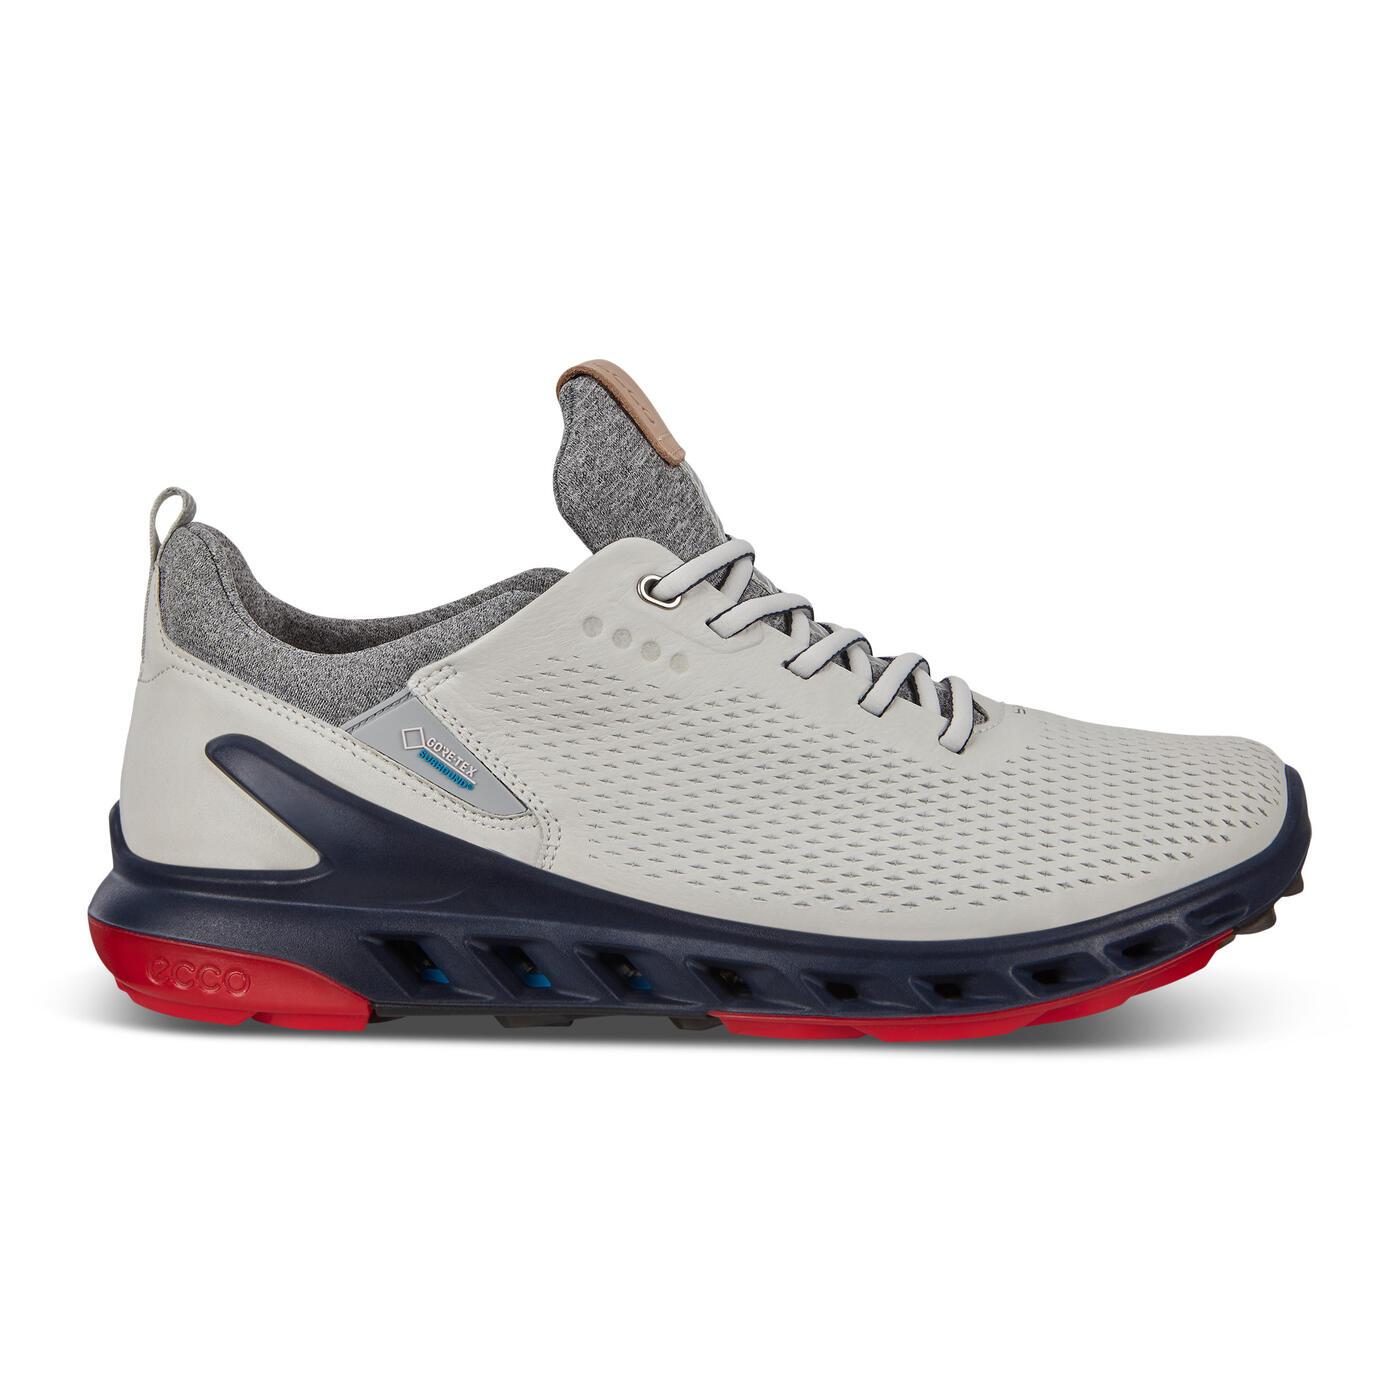 ECCO Men's Golf Biom Cool Pro Golf Shoe